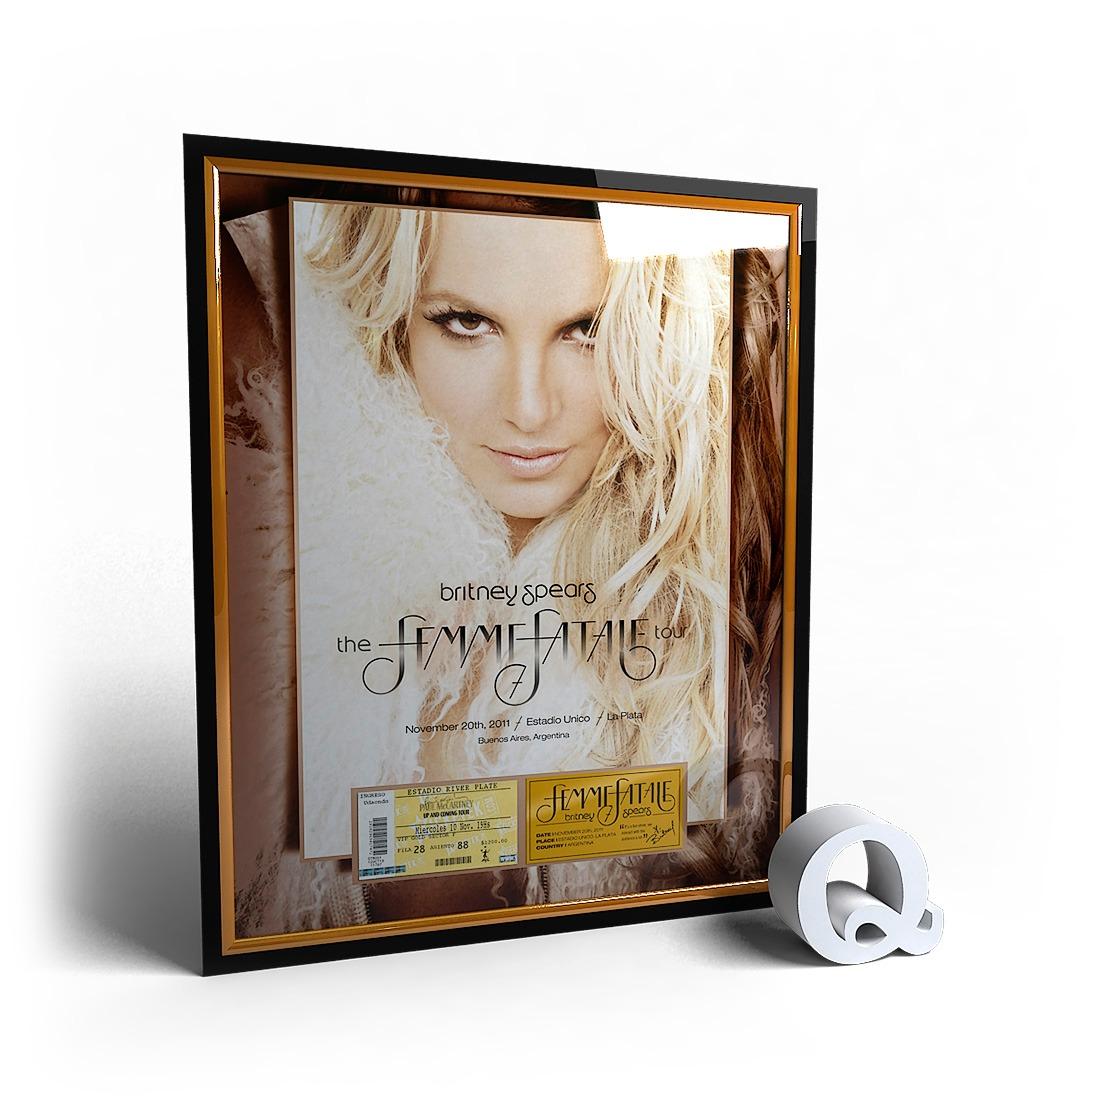 Marco Para Entrada Britney Spears Femme Fatale Tour 2011 - $ 1.350 ...